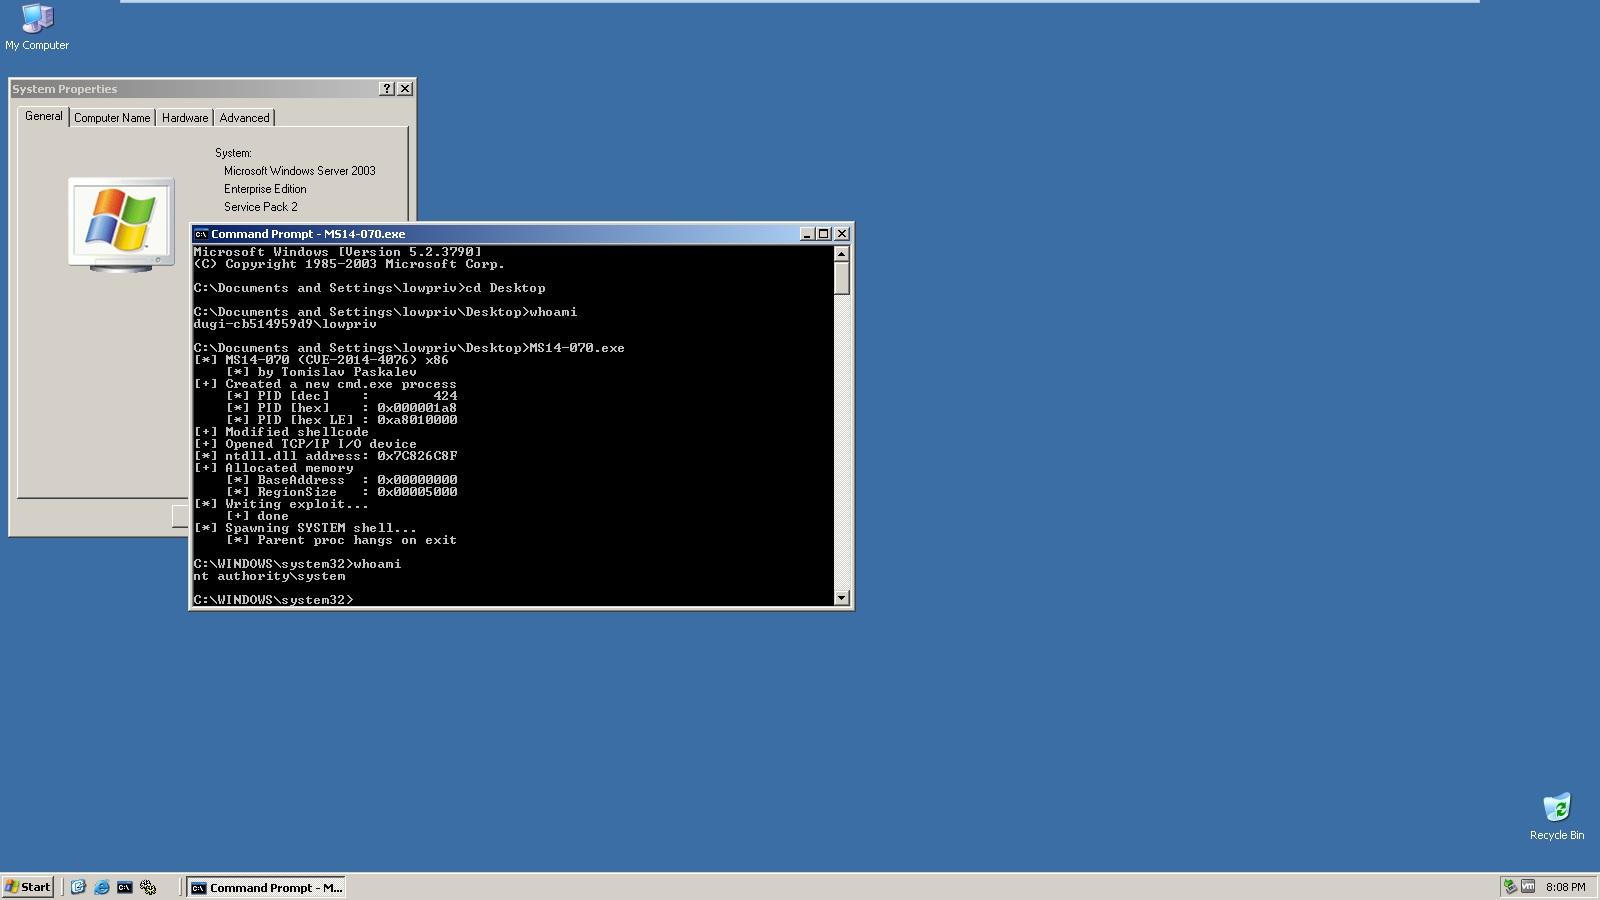 Microsoft Windows Server 2003 SP2 - TCP/IP IOCTL Privilege